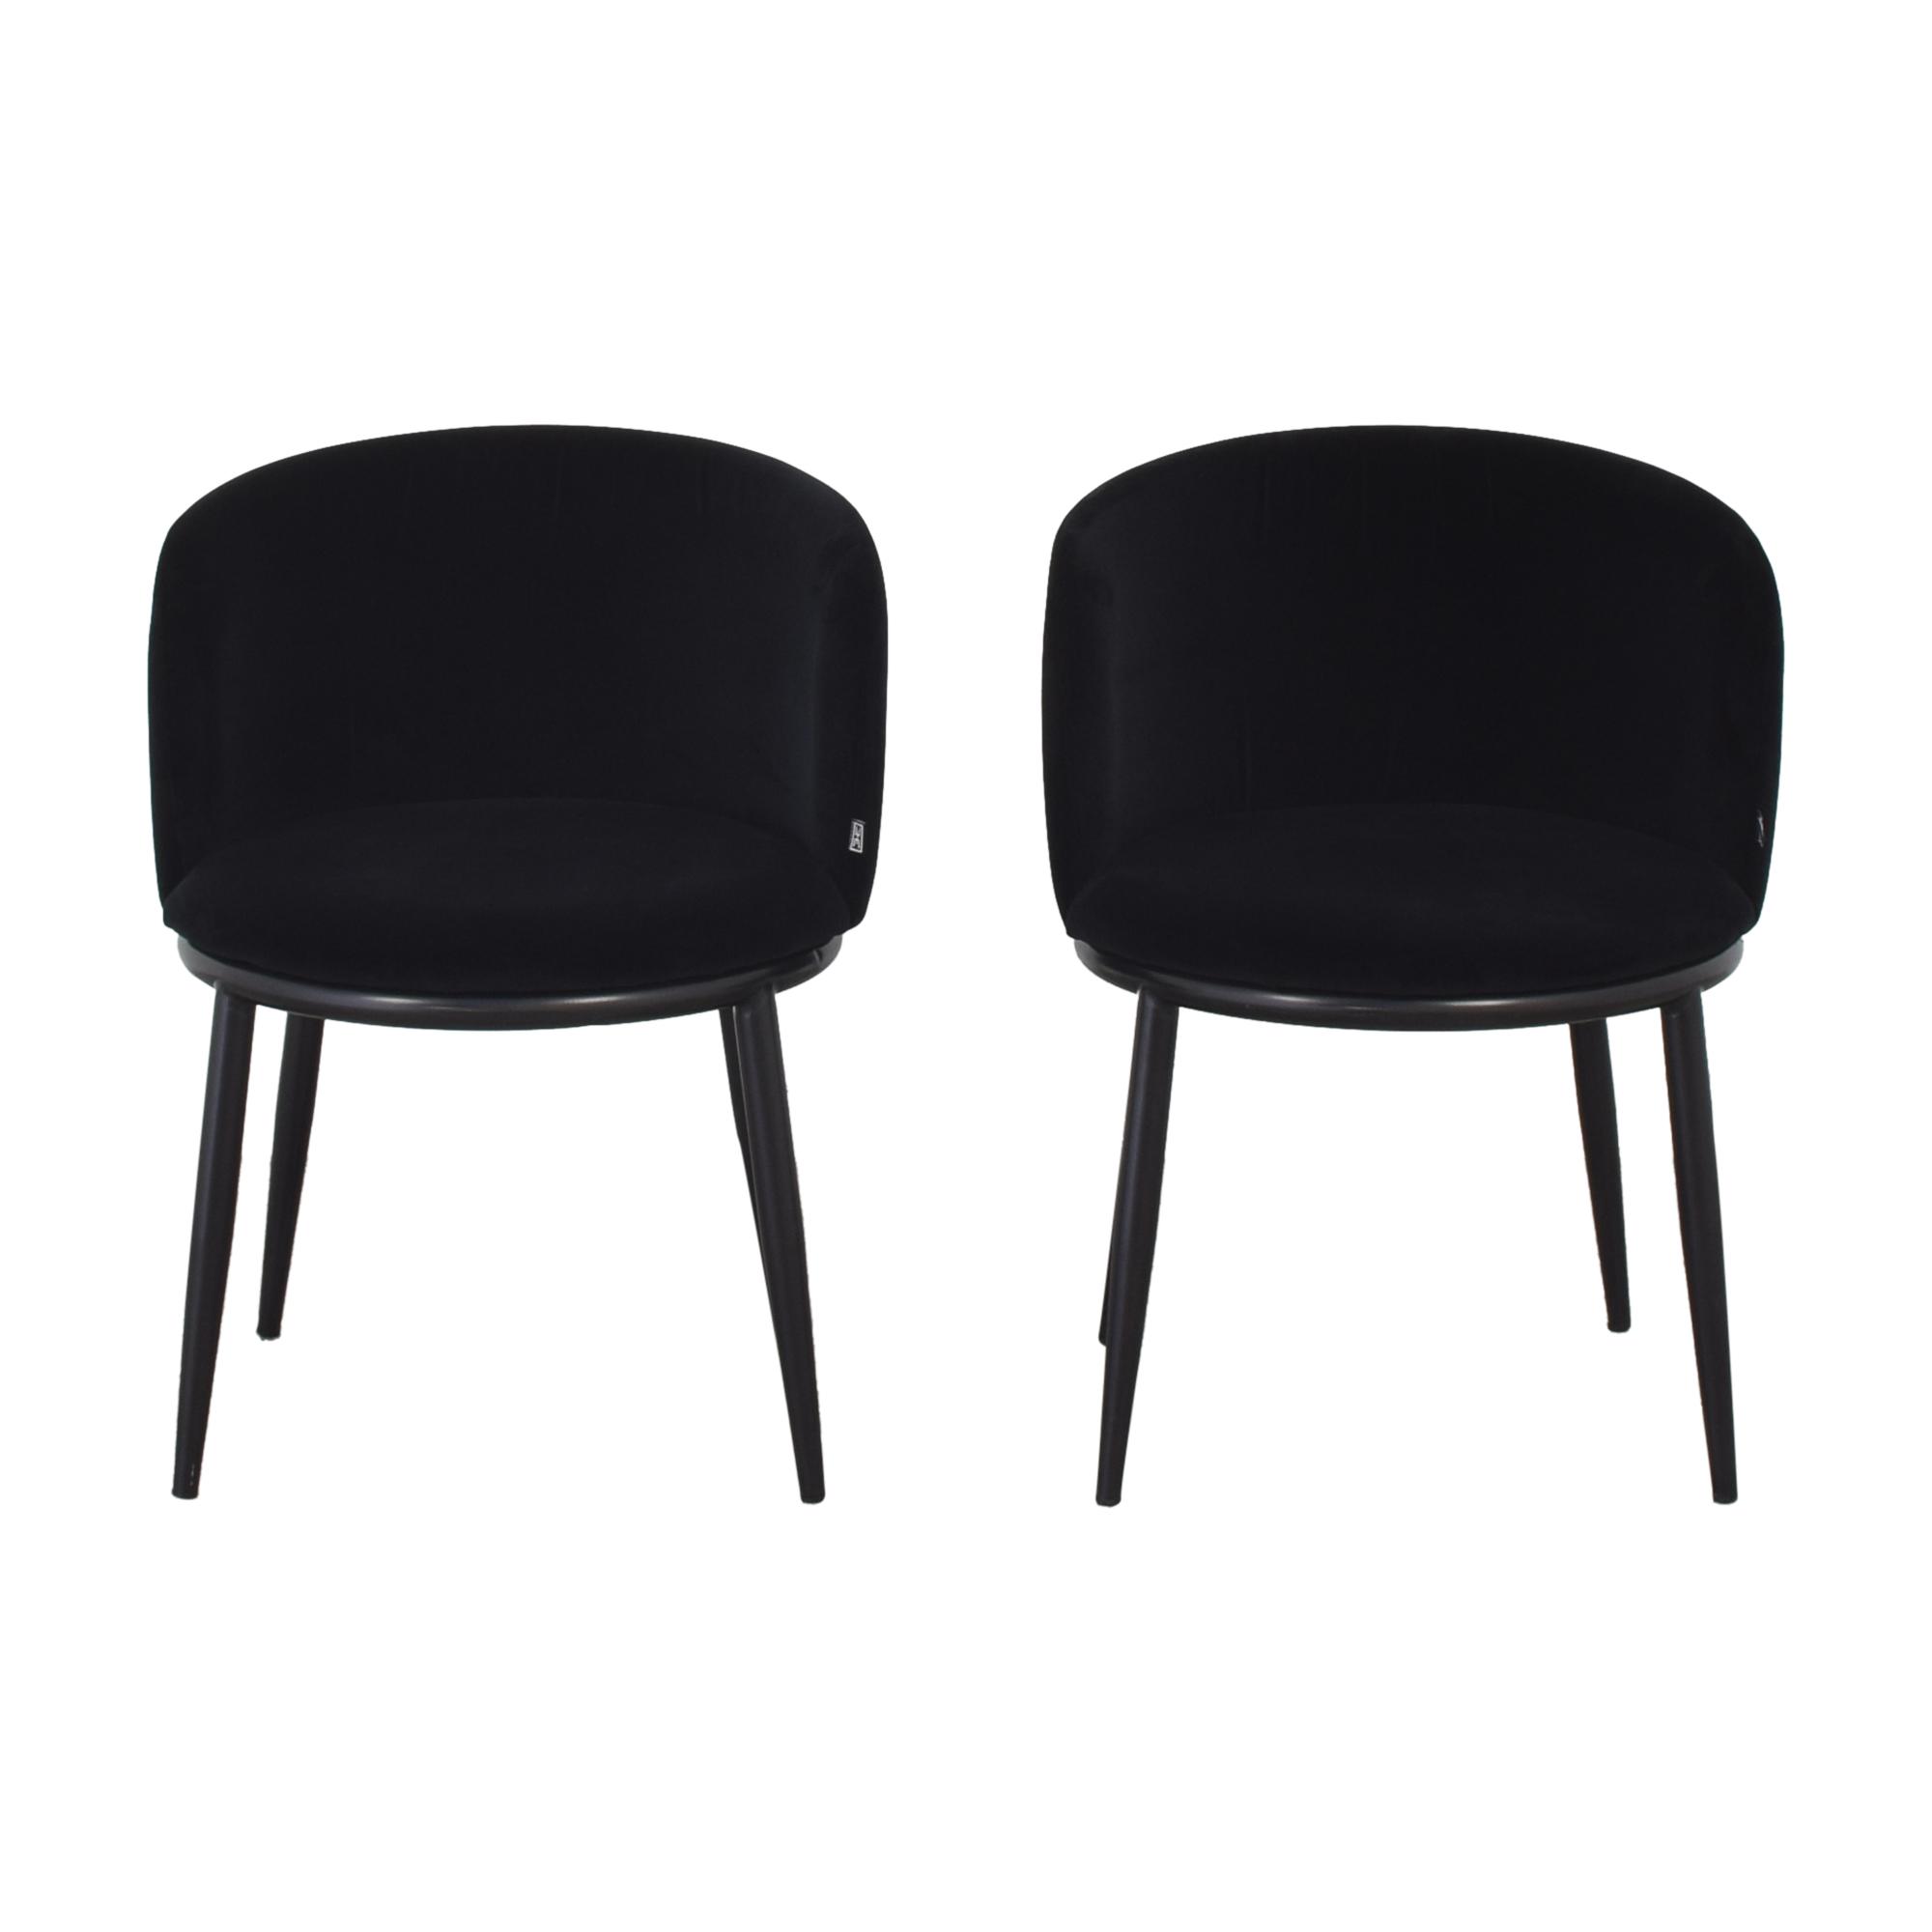 buy Eichholtz Filmore Dining Chairs Eichholtz Dining Chairs